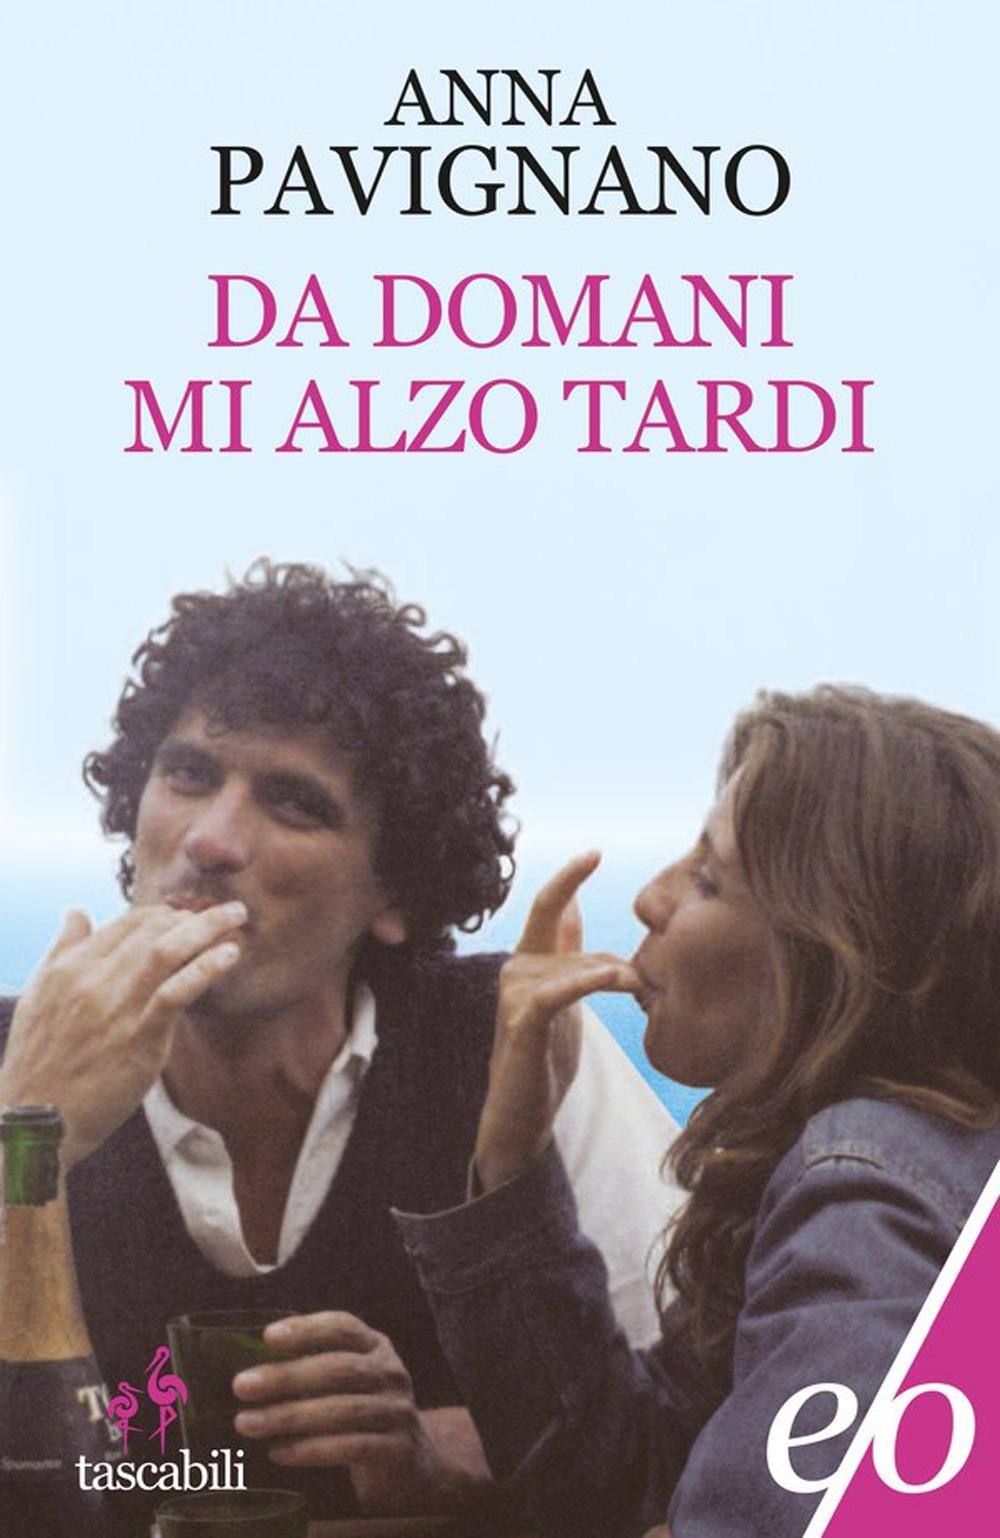 DA DOMANI MI ALZO TARDI - Pavignano Anna - 9788833572789